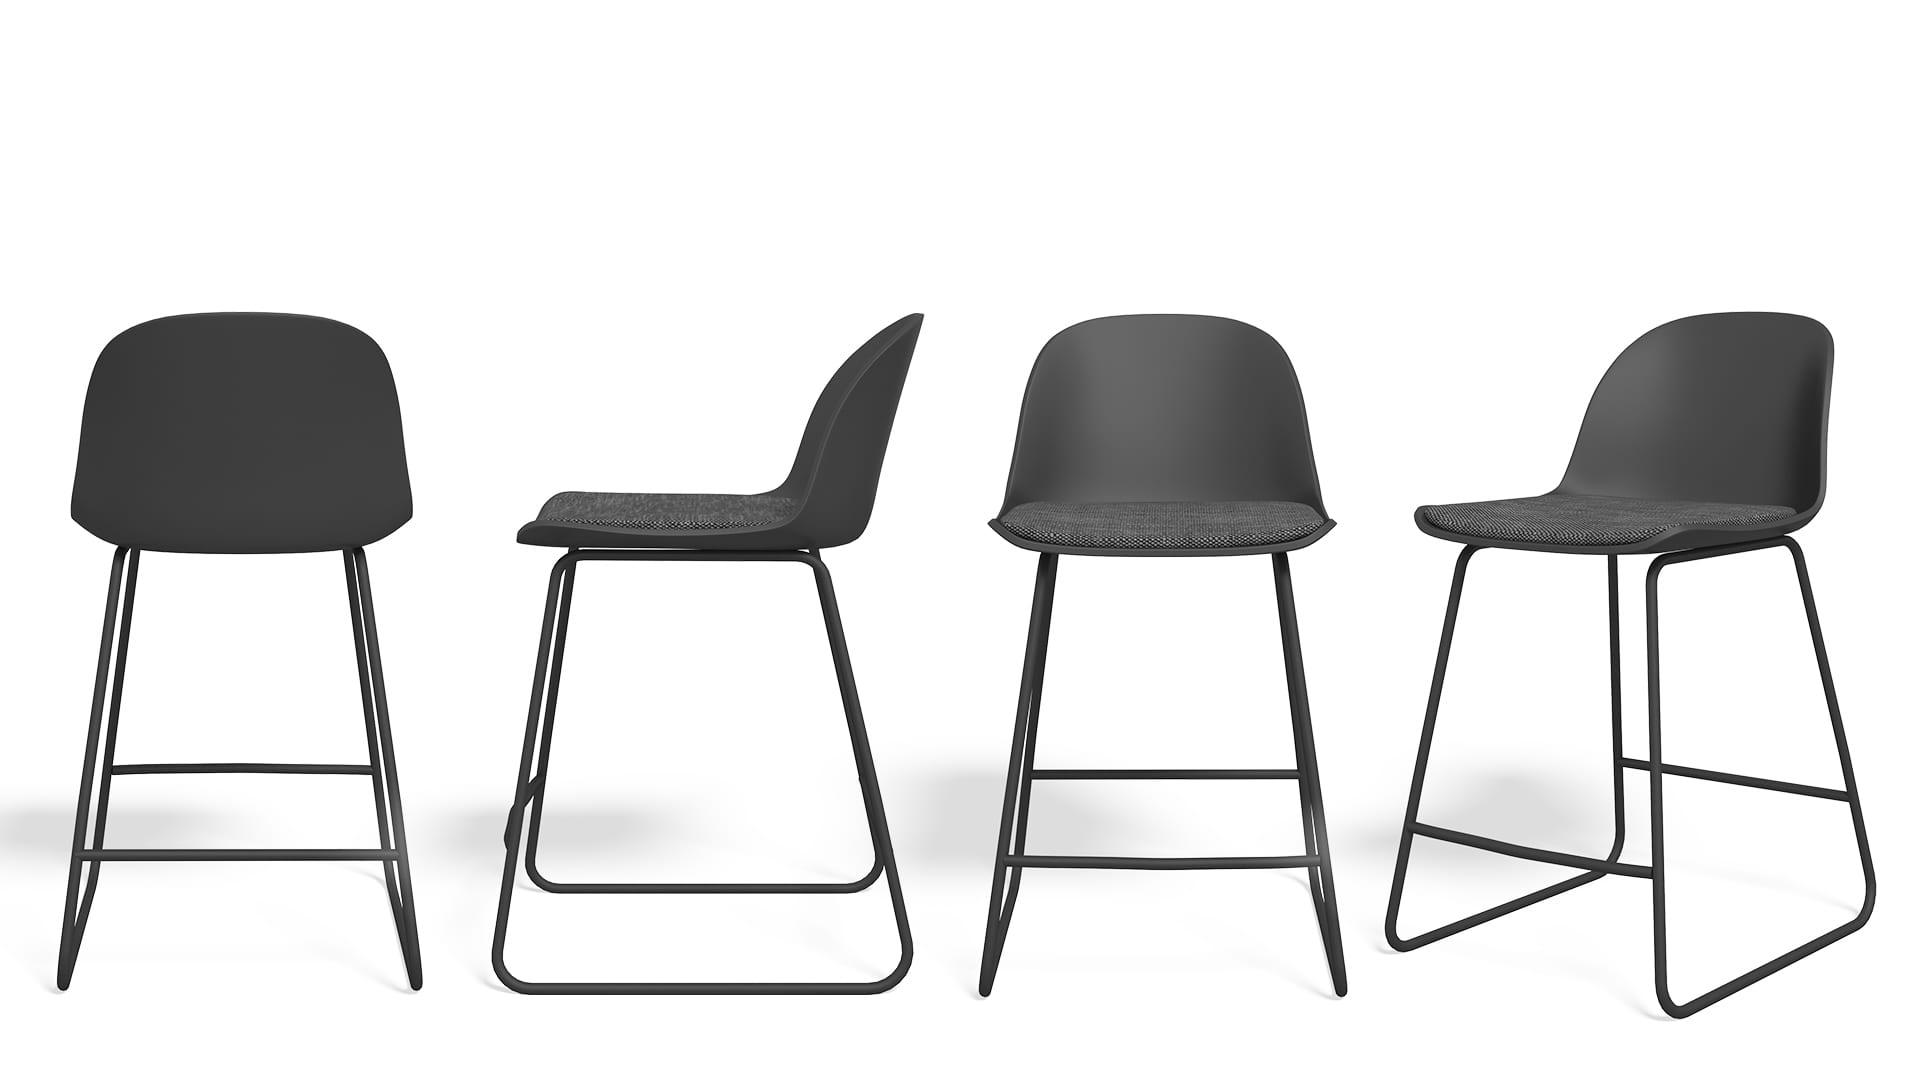 Maayan-Golan_Architectural-Visualization_3d-product-visualization_zaga-dining_bar-stool_09